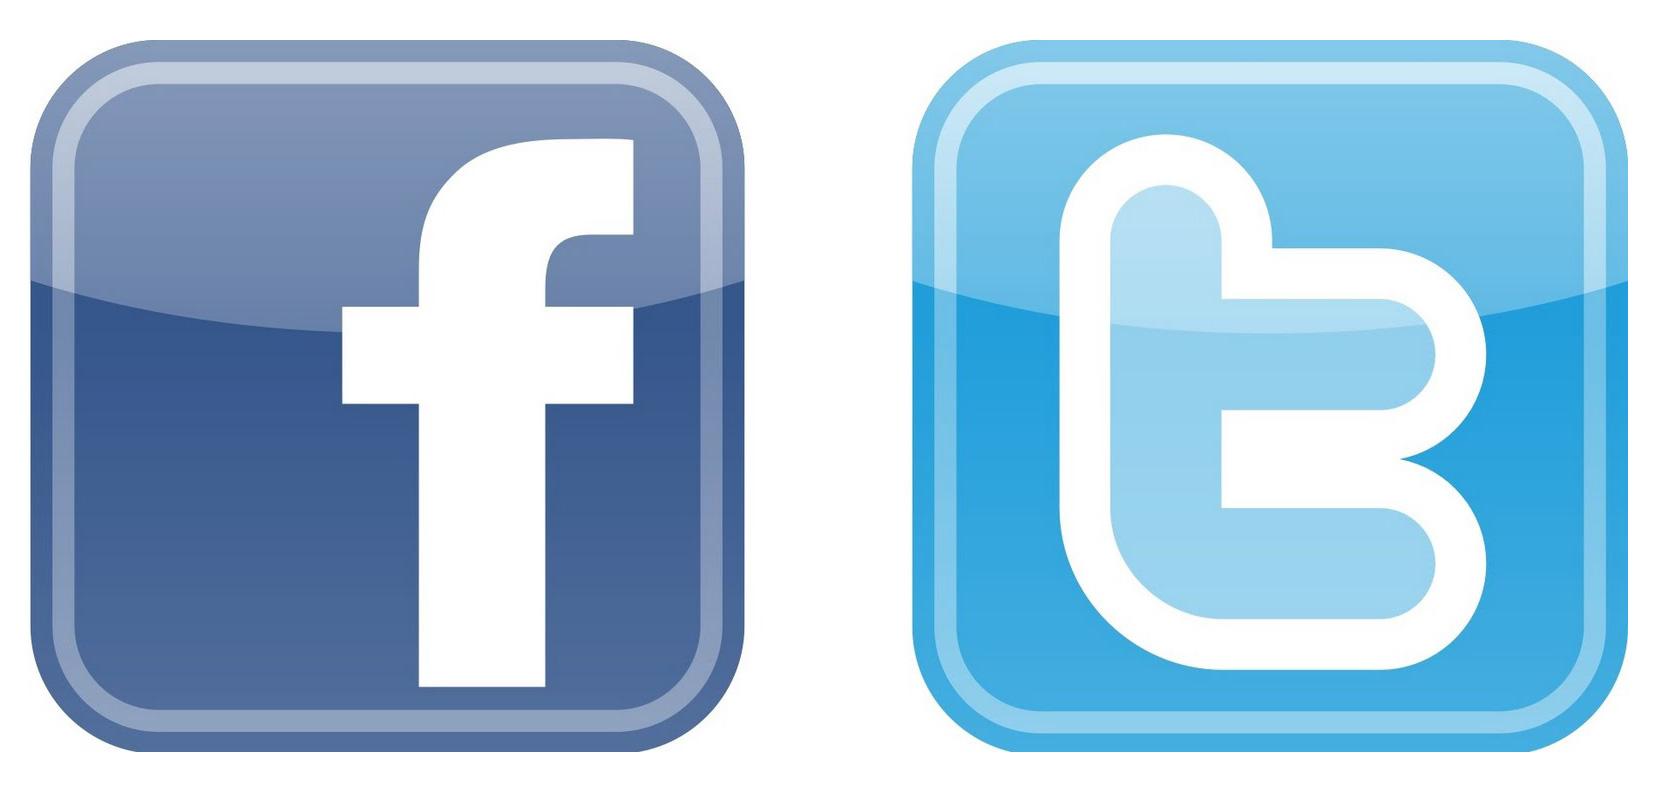 Clipart facebook logo clip art black and white stock Official facebook clipart - ClipartFest clip art black and white stock